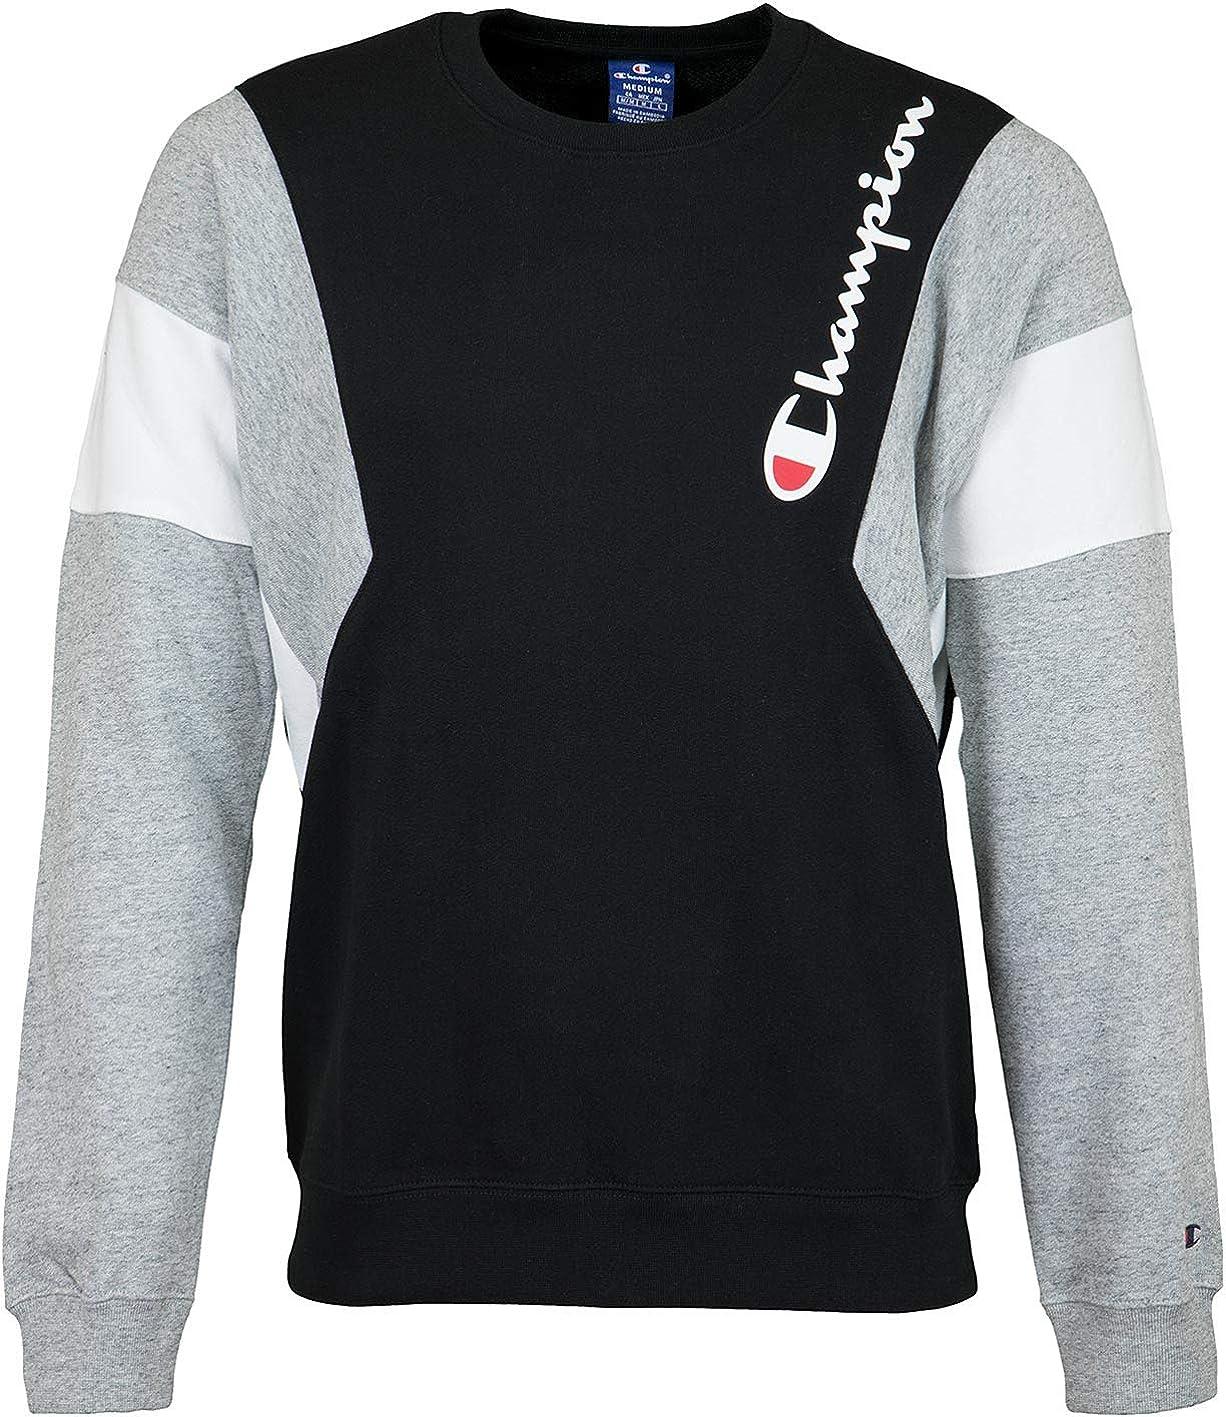 Champion Retro Sweatshirt Sweater